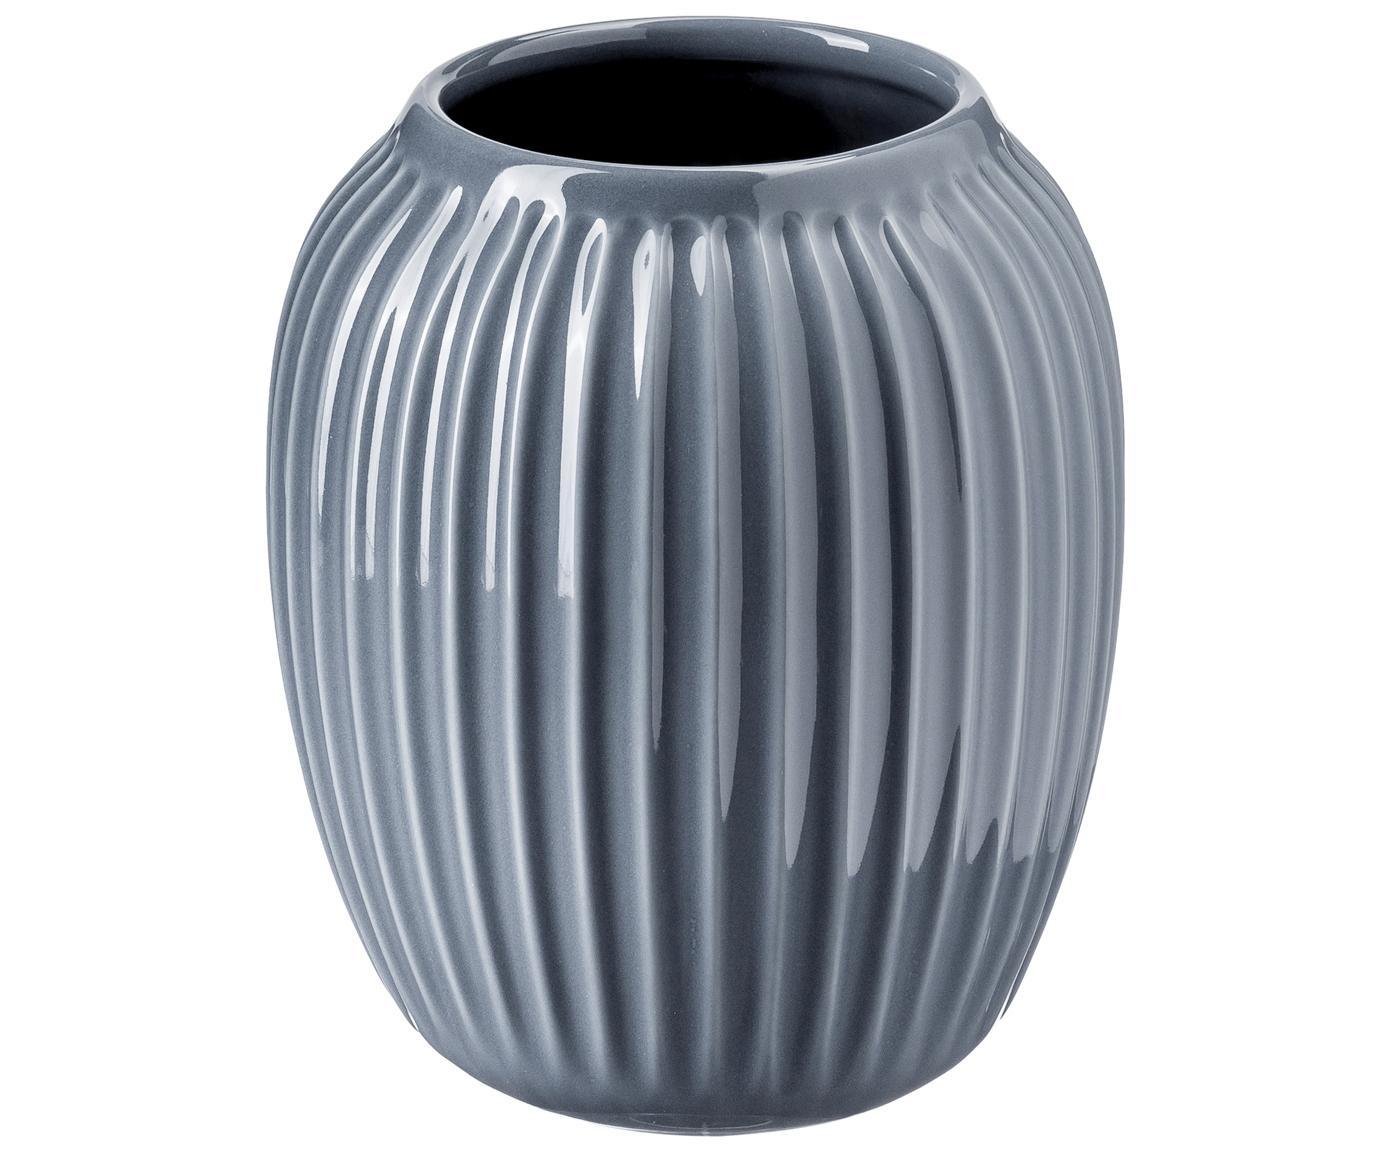 Jarrón artesanal de diseño Hammershøi, Porcelana, Gris antracita, Ø 17 x Al 20 cm